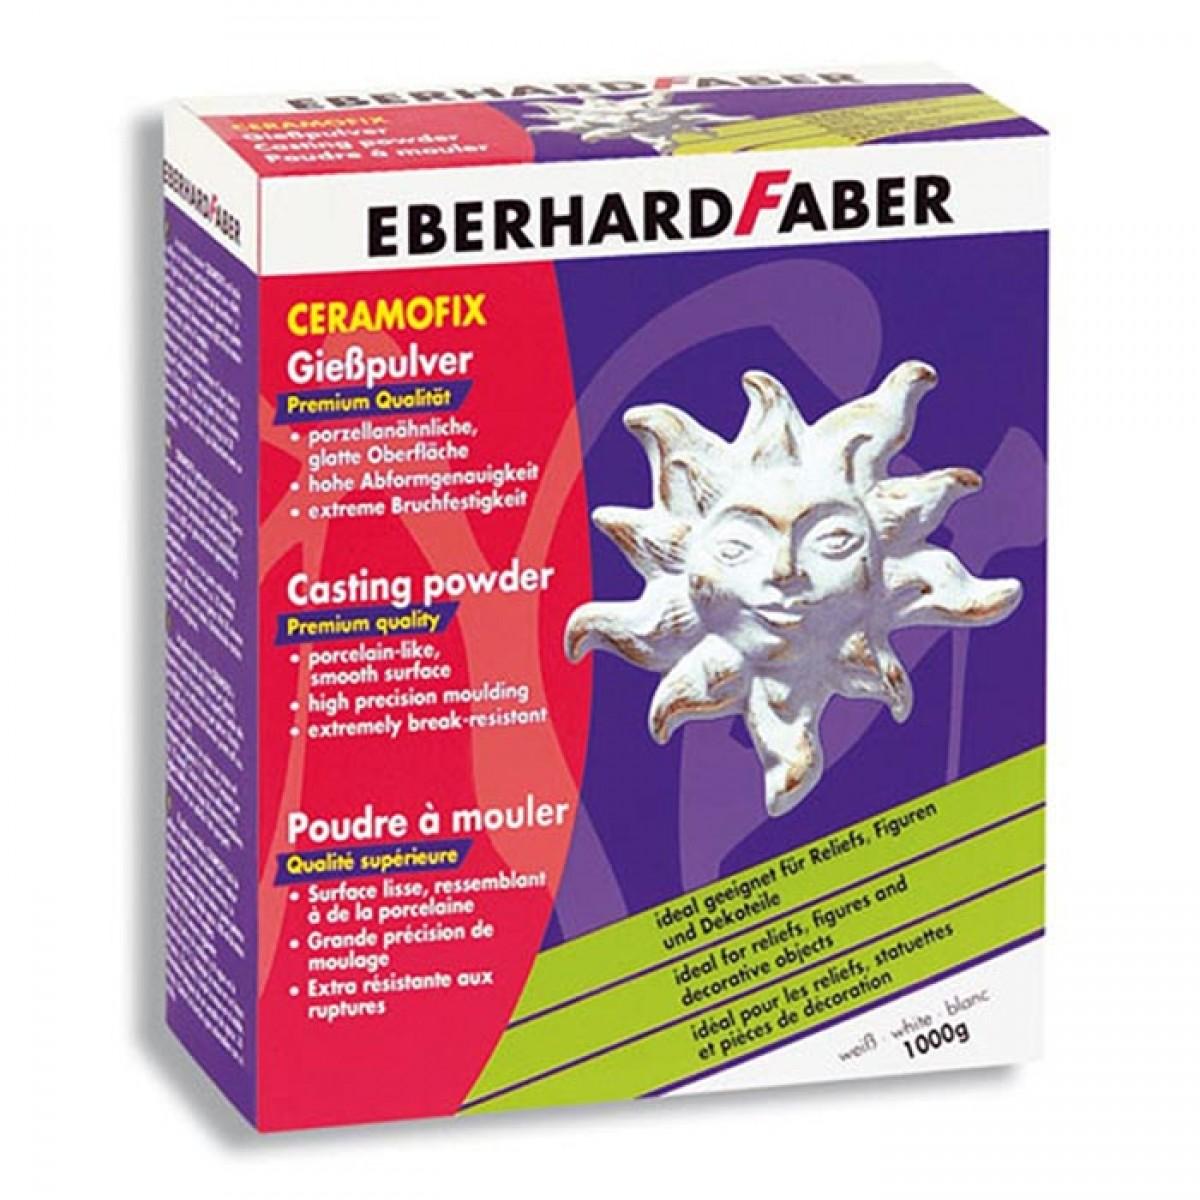 Eberhard Faber Γύψος Καλλιτεχνίας Λευκός - Τερακότα (1kg) Είδη Ζωγραφικής